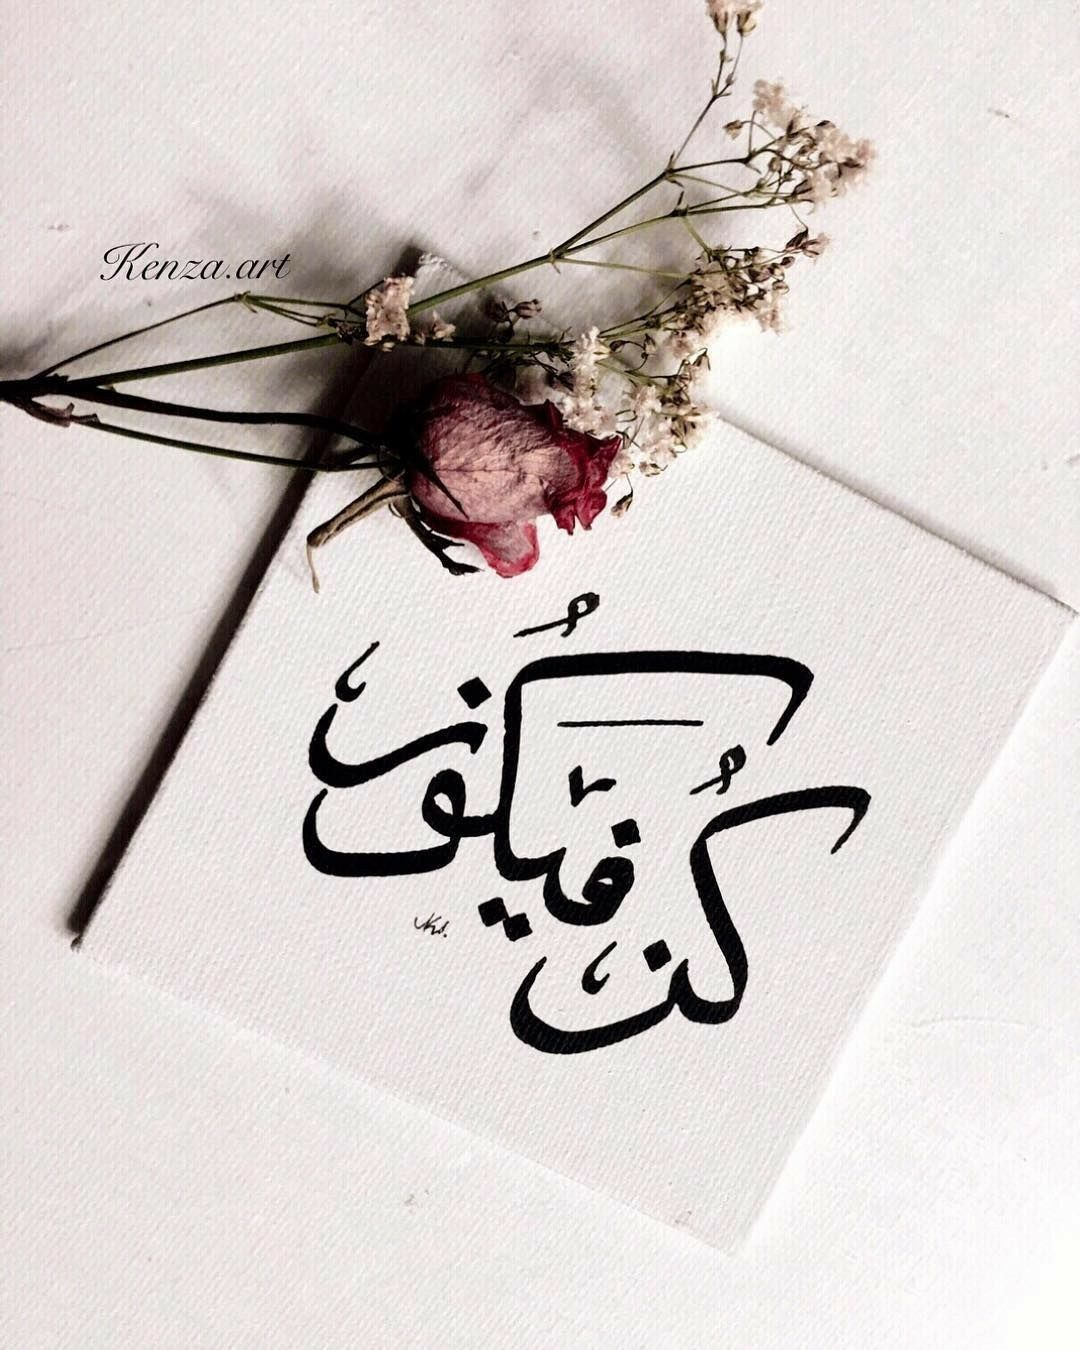 Pin By Salma Khoerunnisa On Islamic Urdu Quotes Deep Islamic Art Calligraphy Islamic Caligraphy Art Arabic Calligraphy Painting